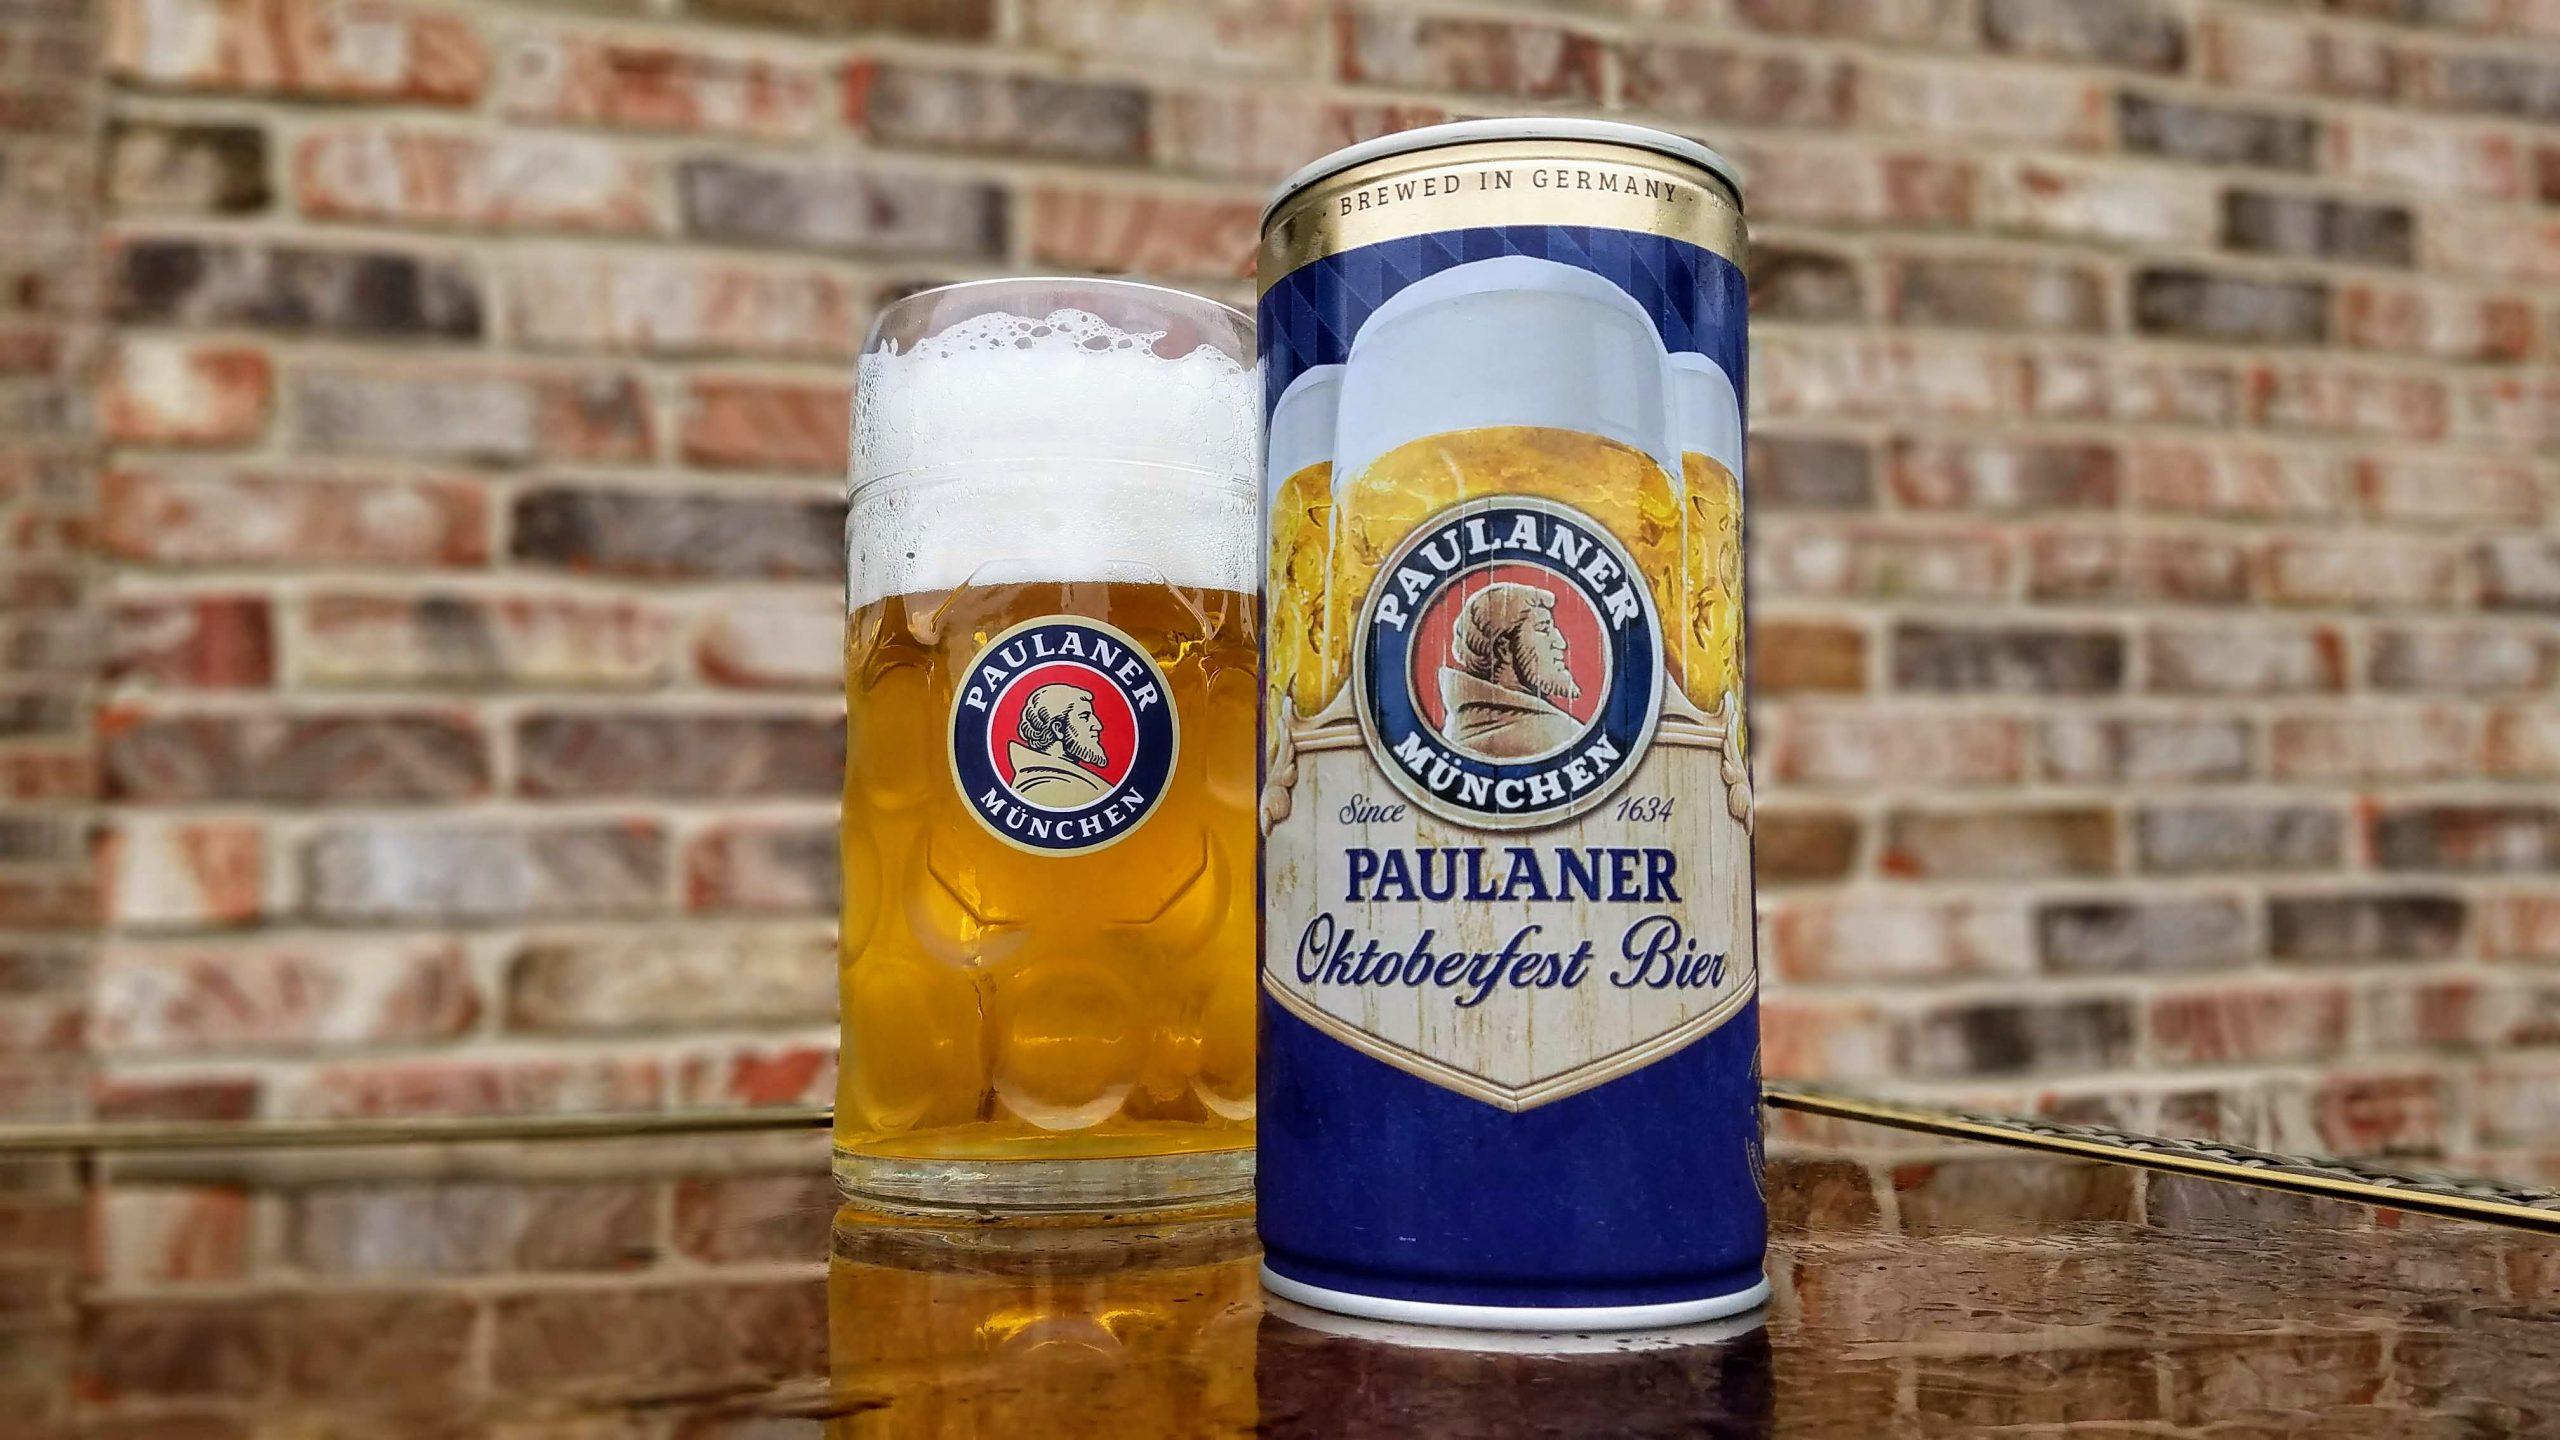 Paulaner Oktoberfest Lager in 1-liter can and mug set